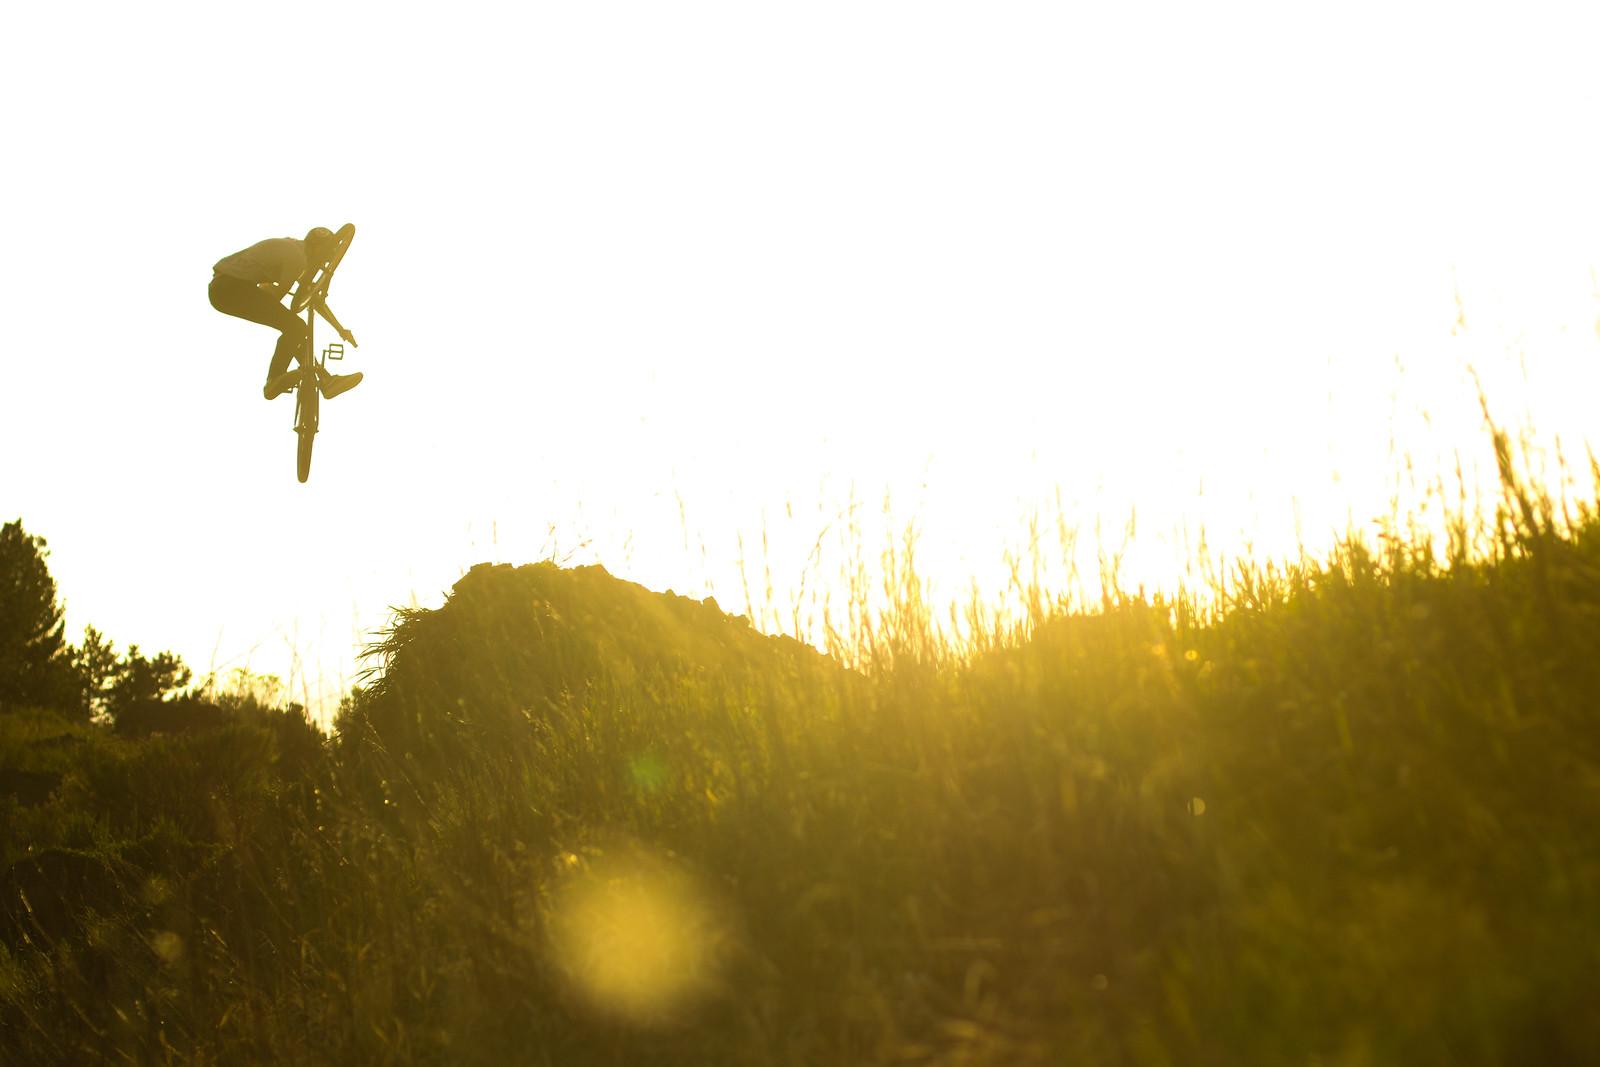 IMG 9671 - Tory_Powers - Mountain Biking Pictures - Vital MTB